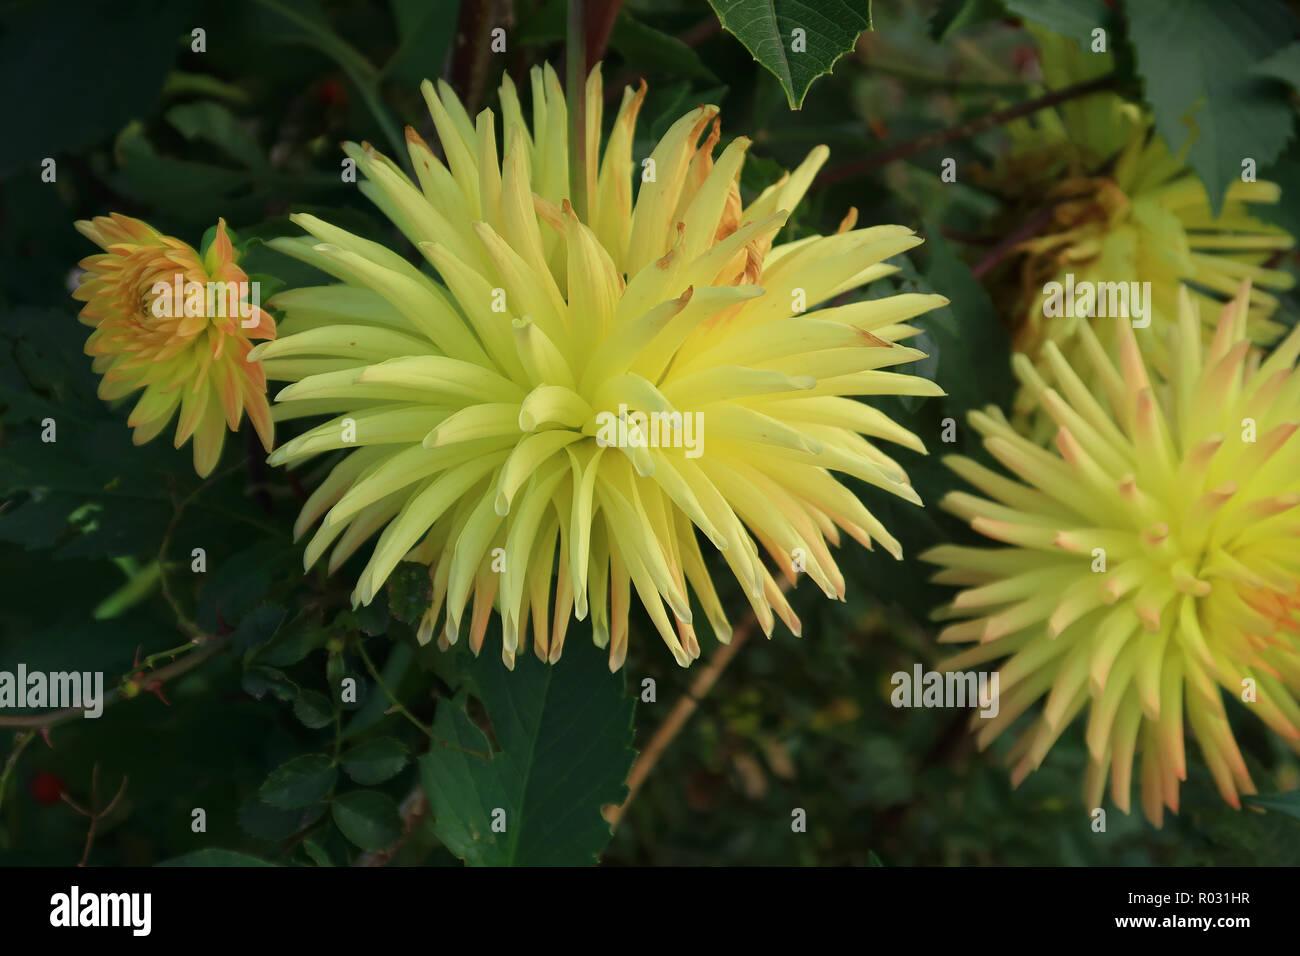 Yellow Semi cactus Dahlia - Stock Image